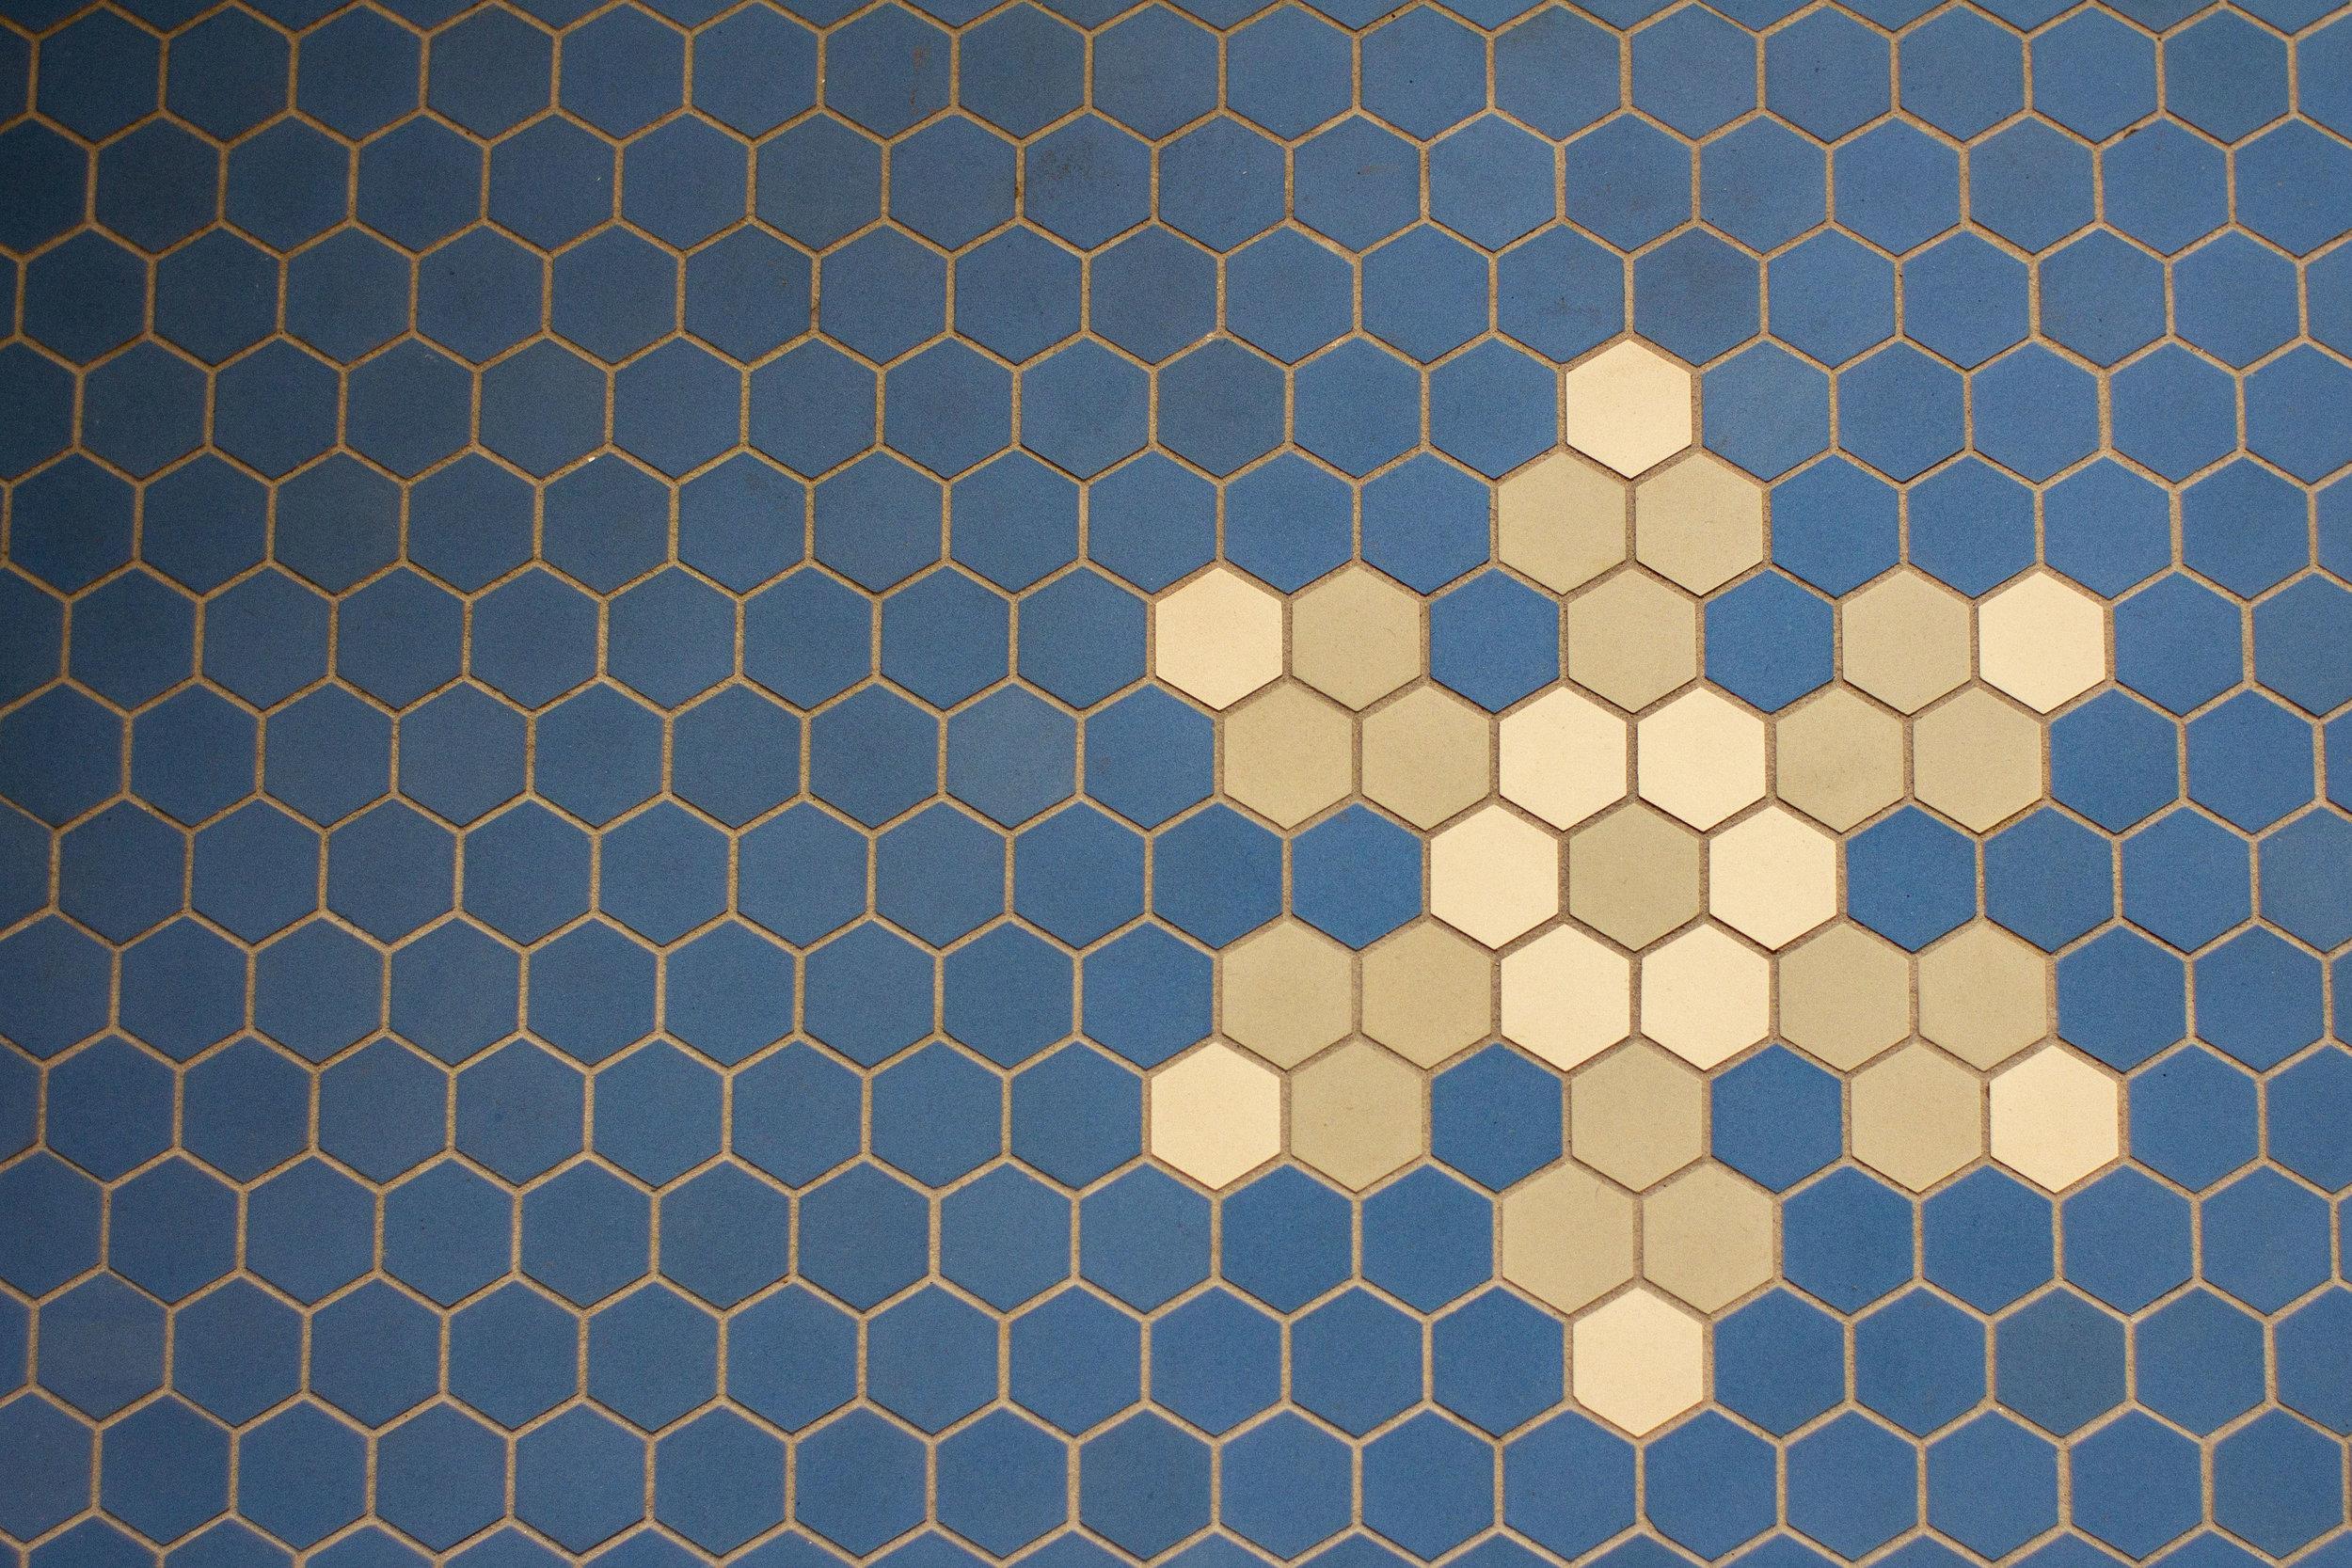 Blue tile with light snowflake design.jpg